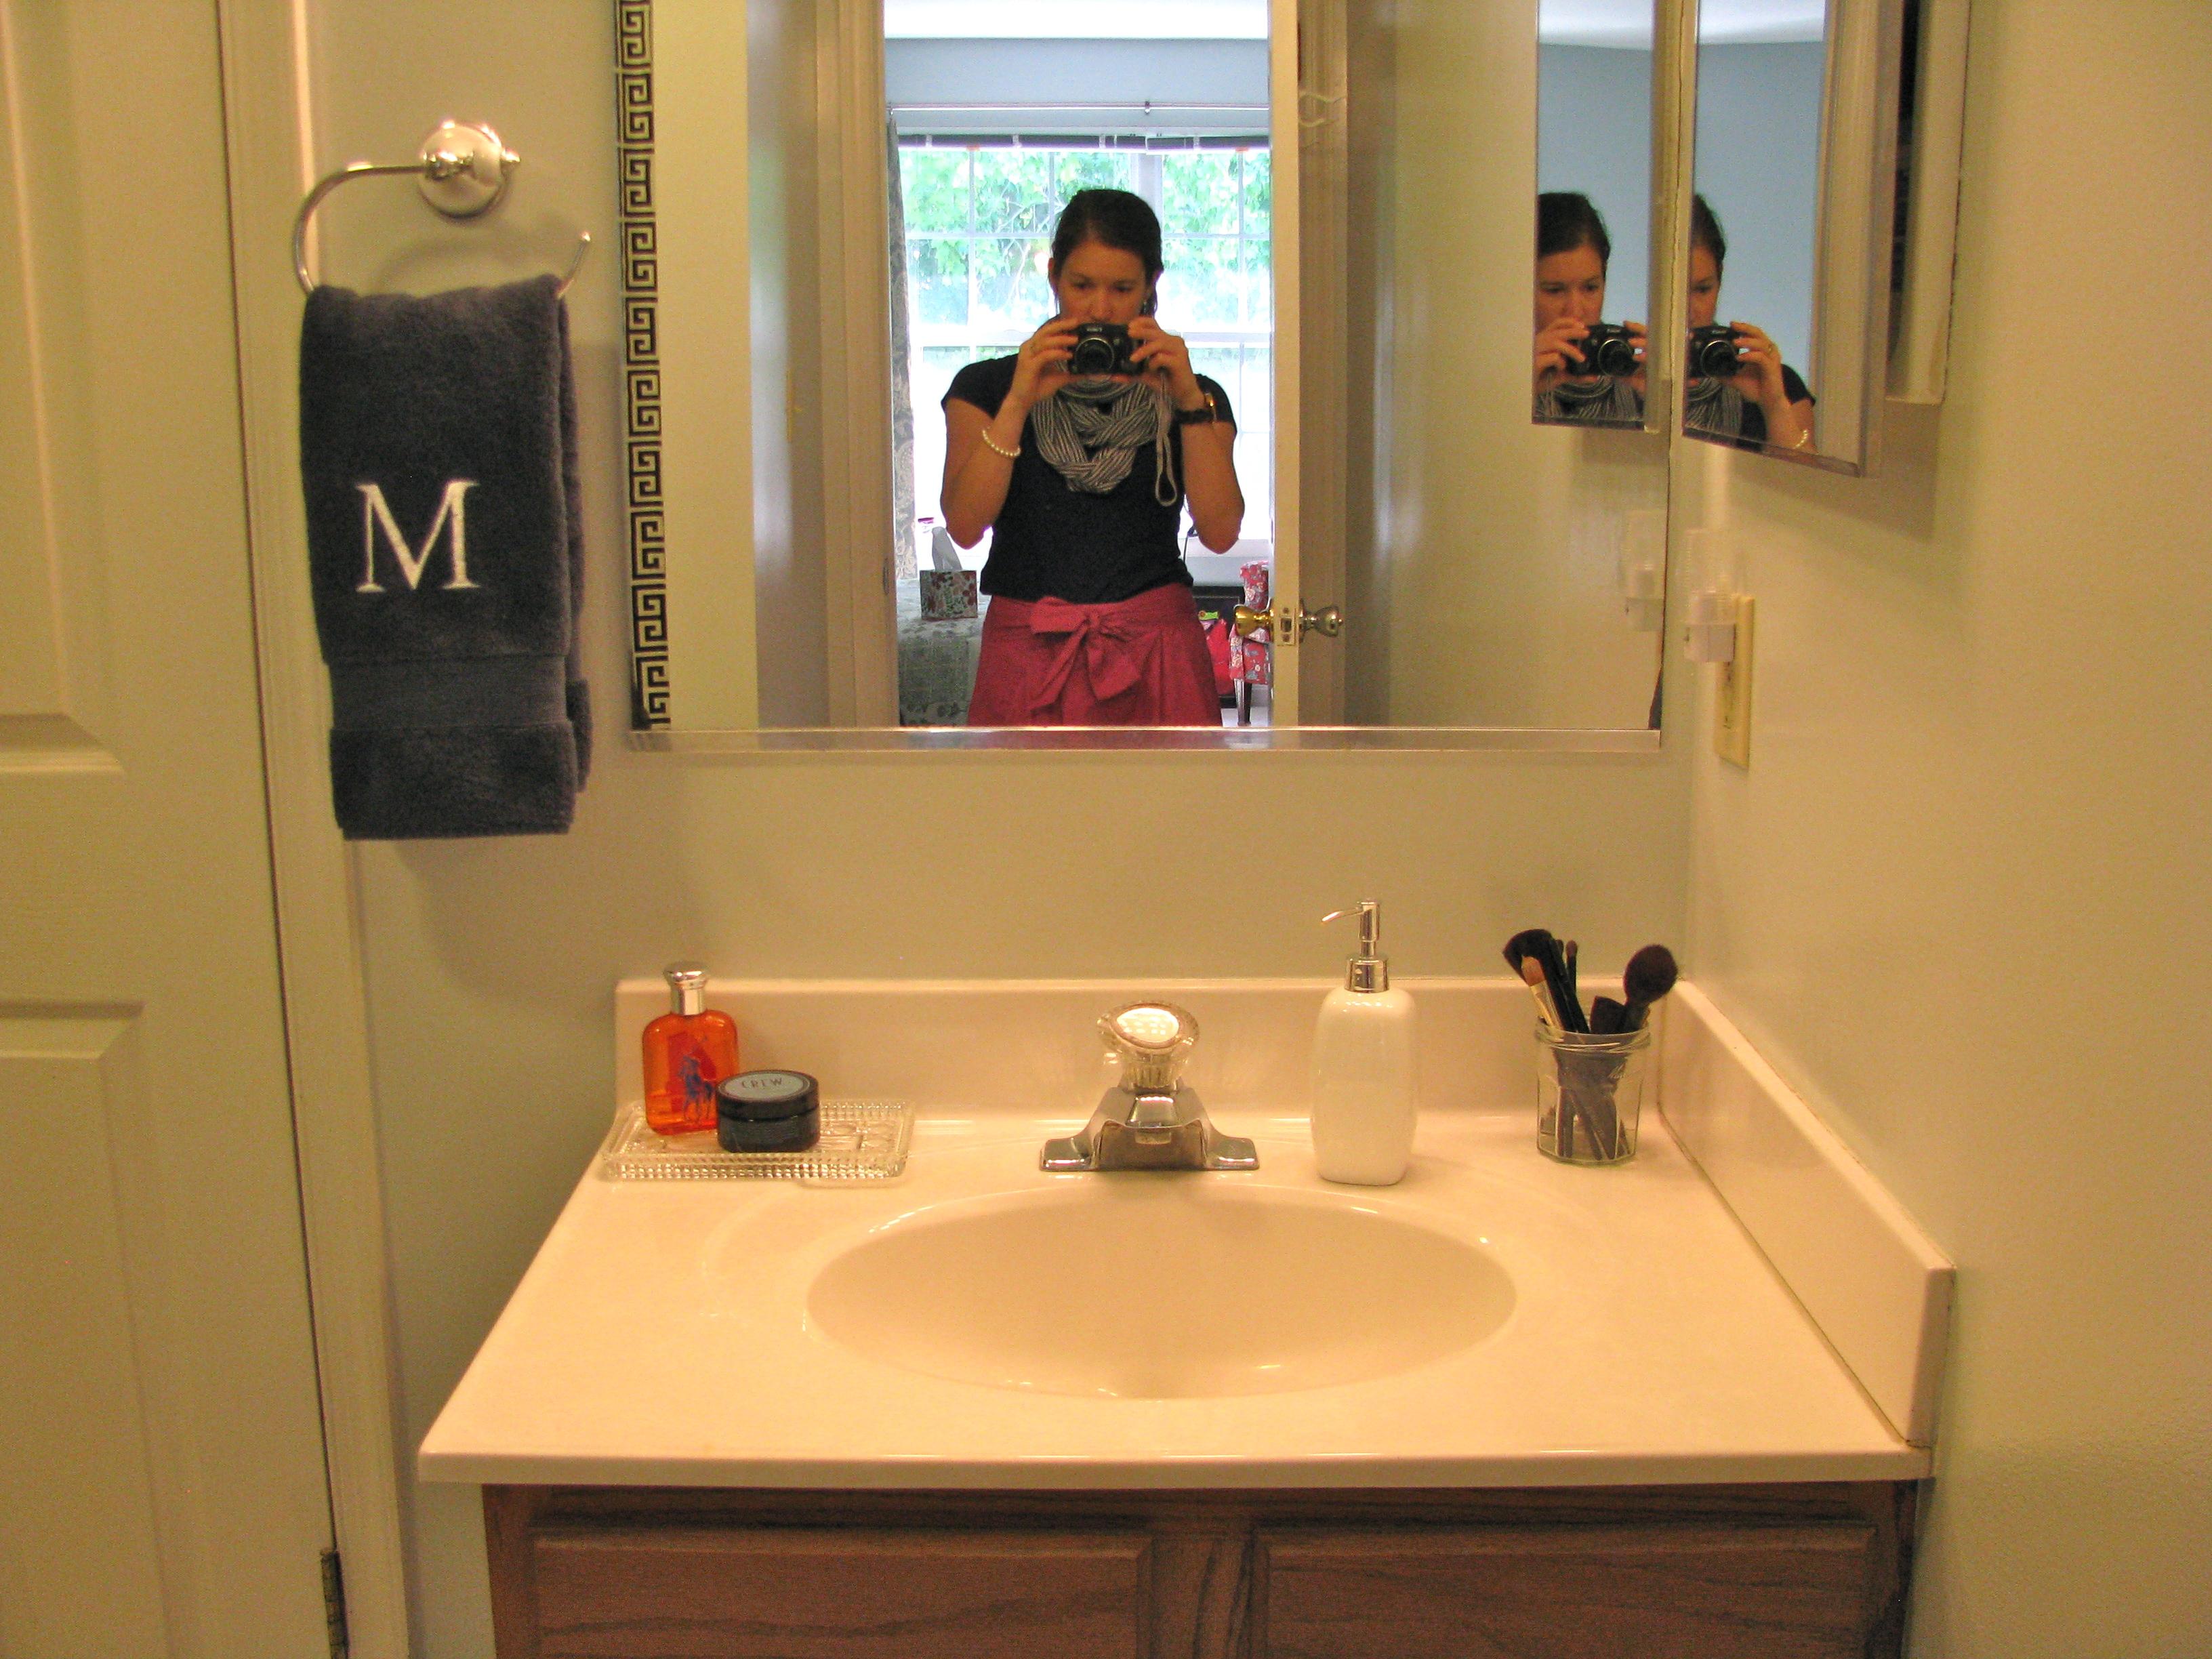 Standard height of bathroom towel bar - Image